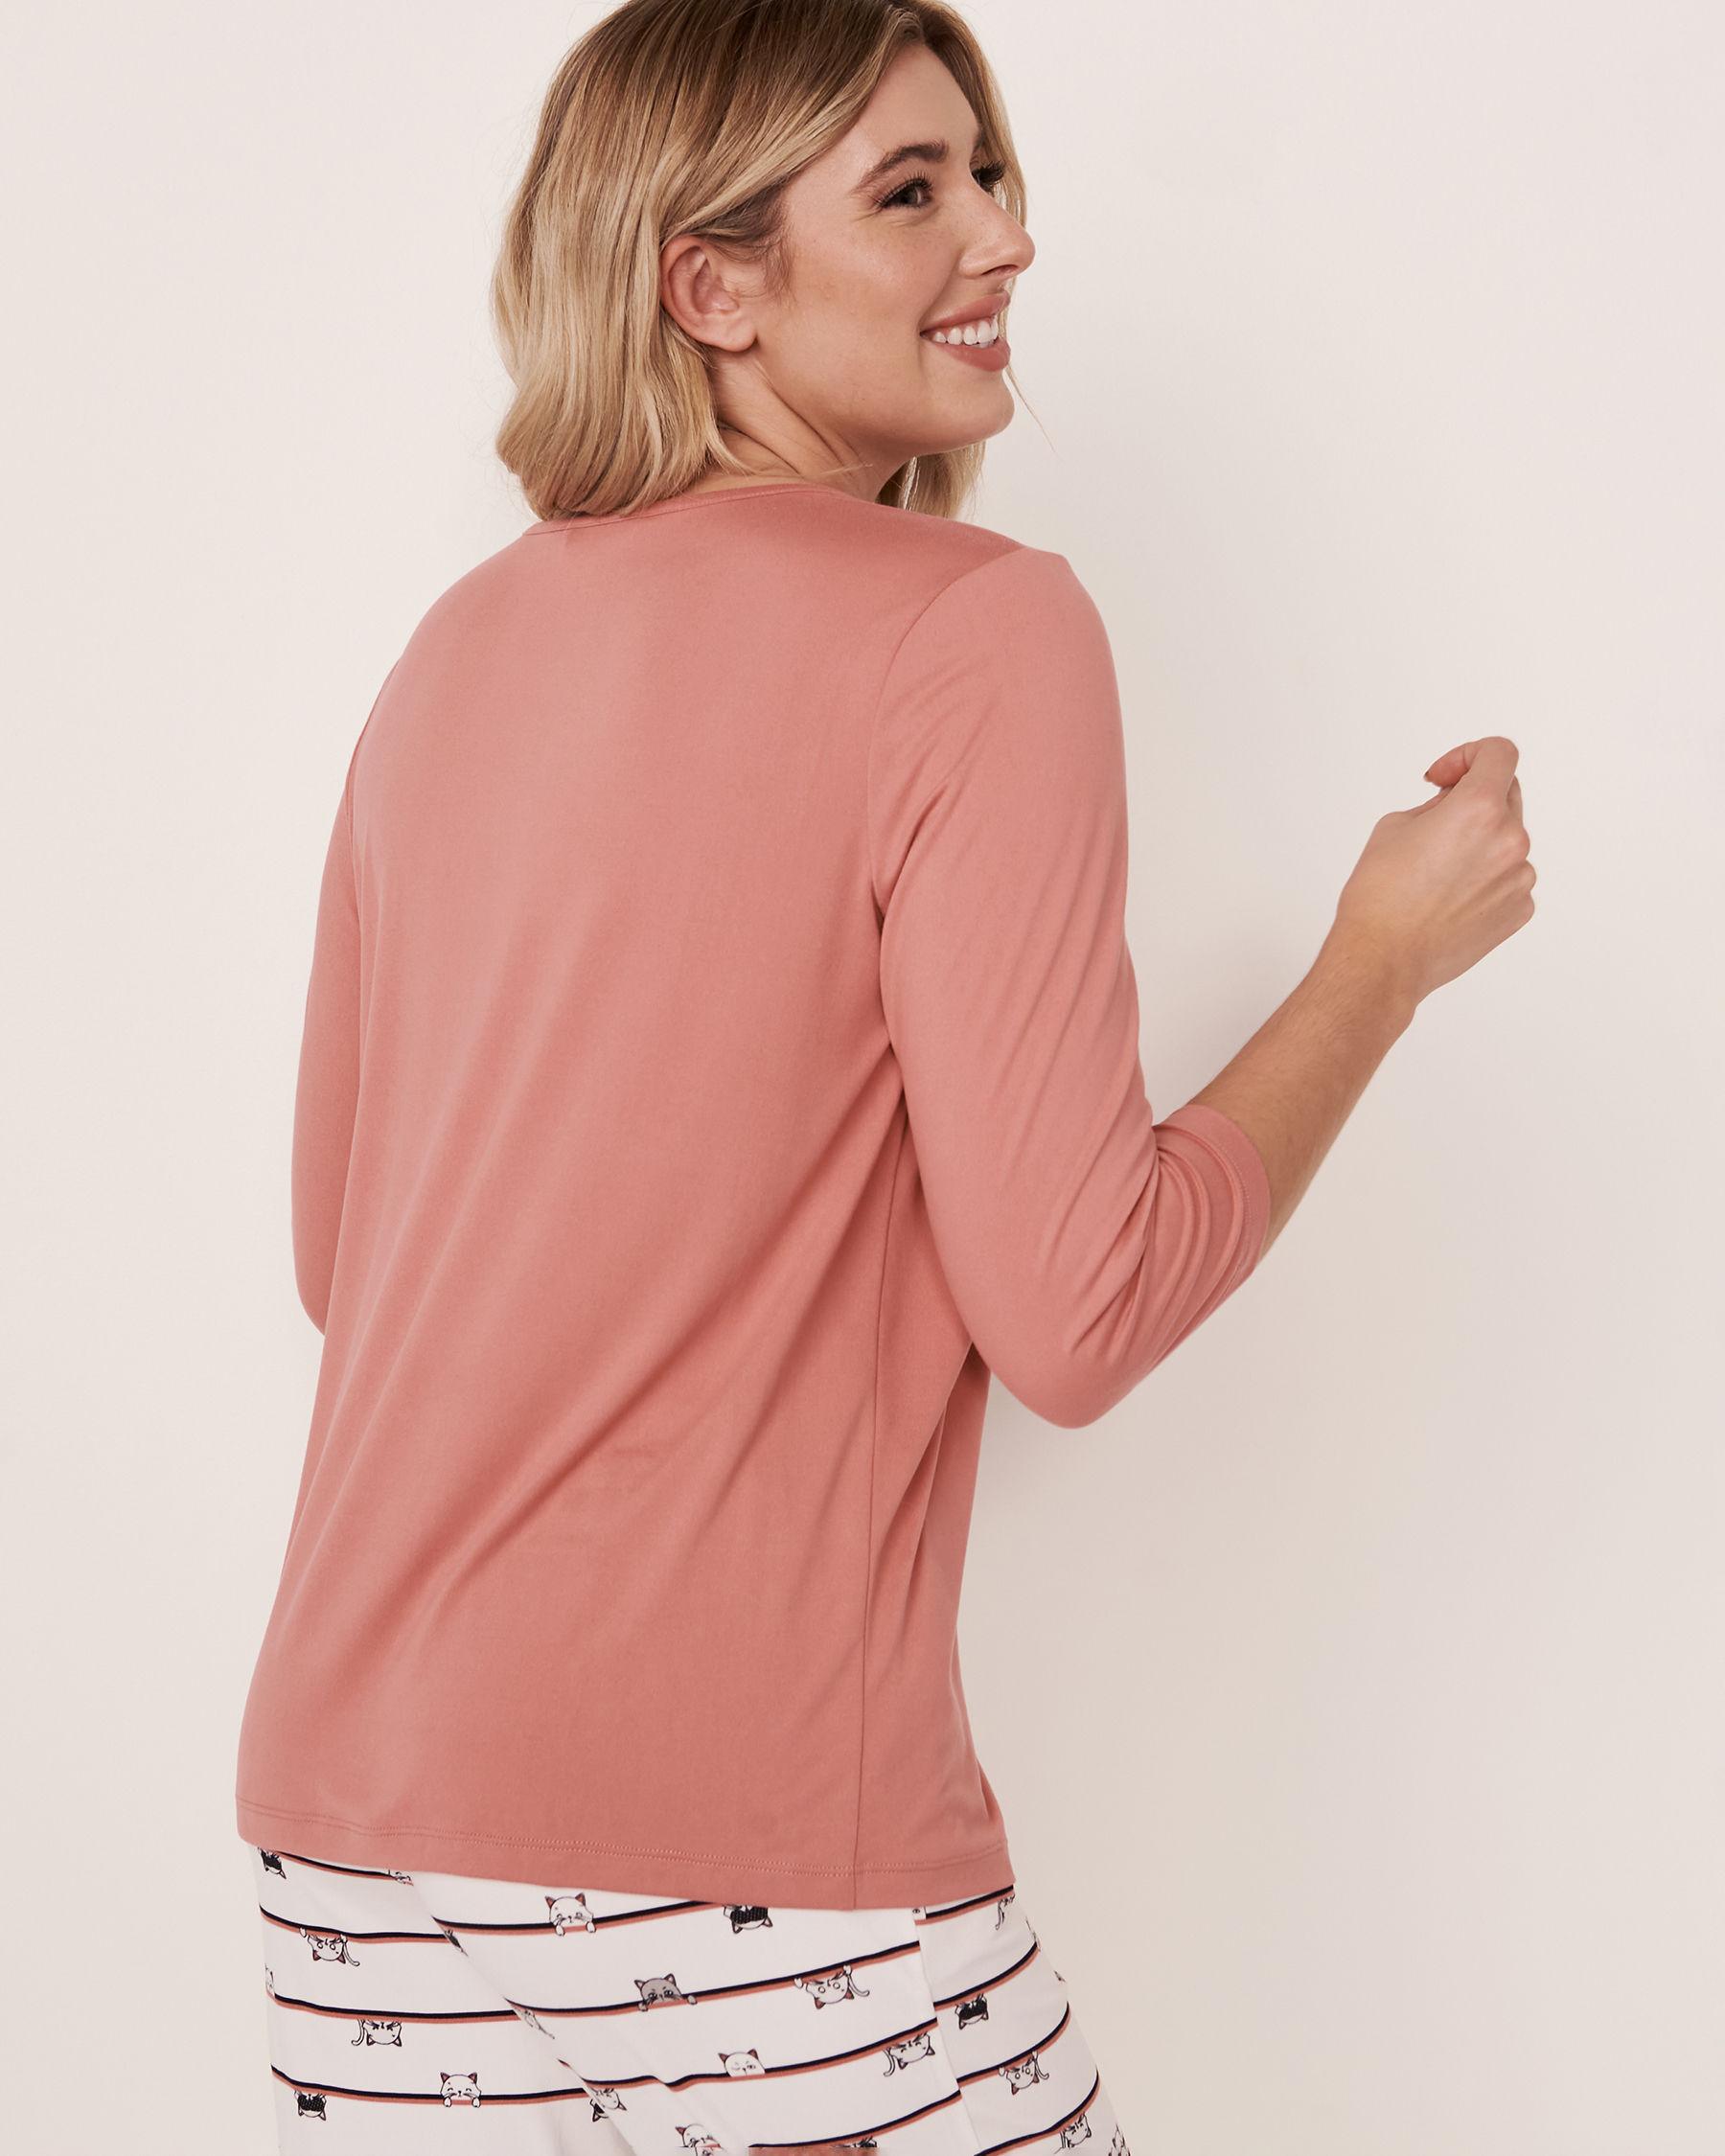 LA VIE EN ROSE V-neckline 3/4 Sleeve Shirt Dusty rose 40100087 - View2